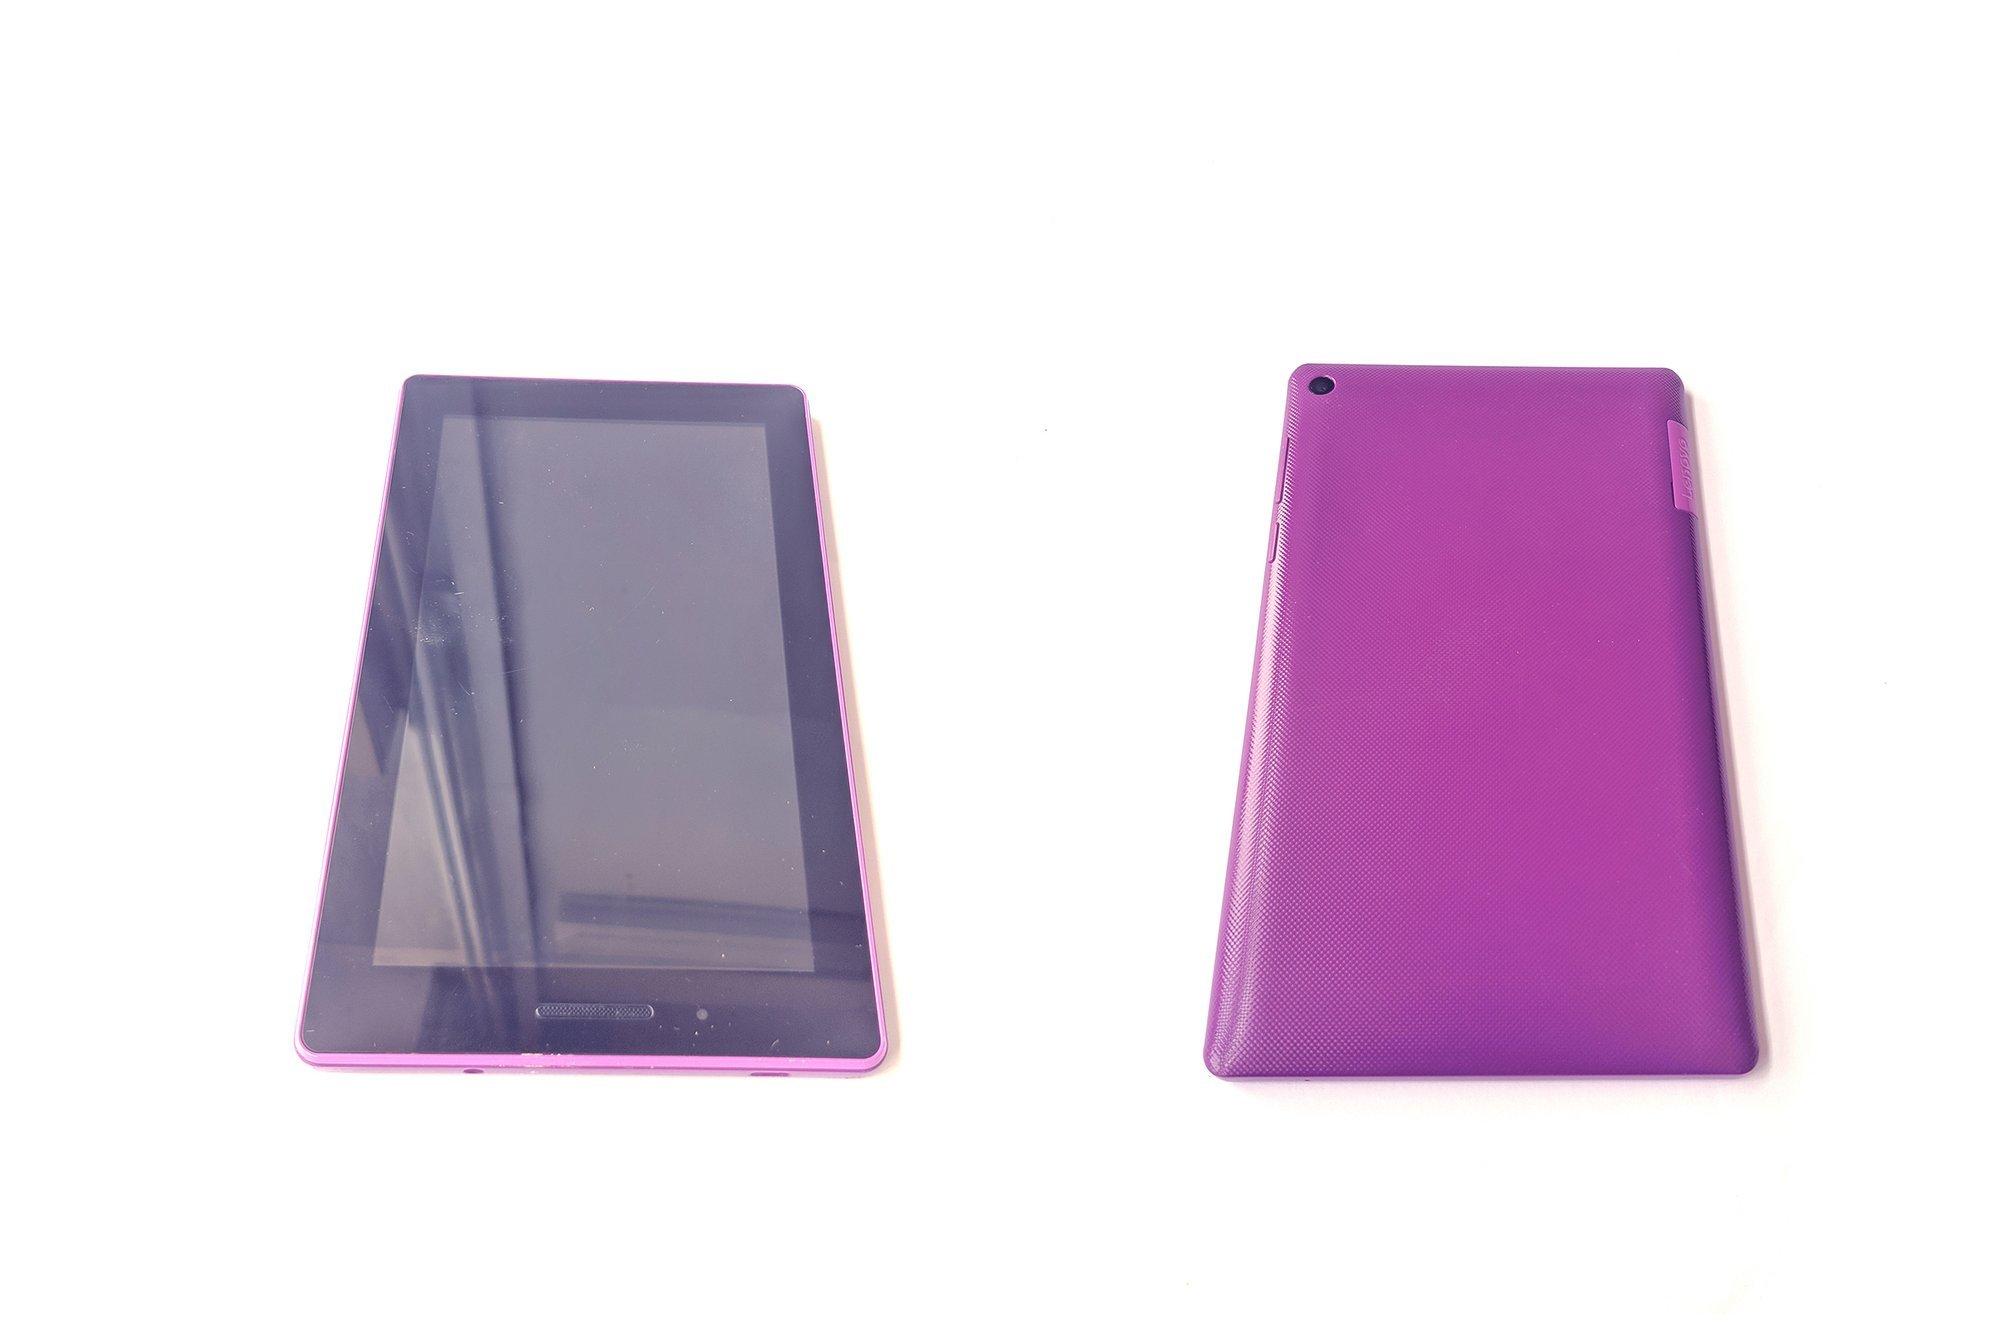 Tablet Lenovo TAB3 7 Essential 8GB Wi-Fi Dark Purple Grade C